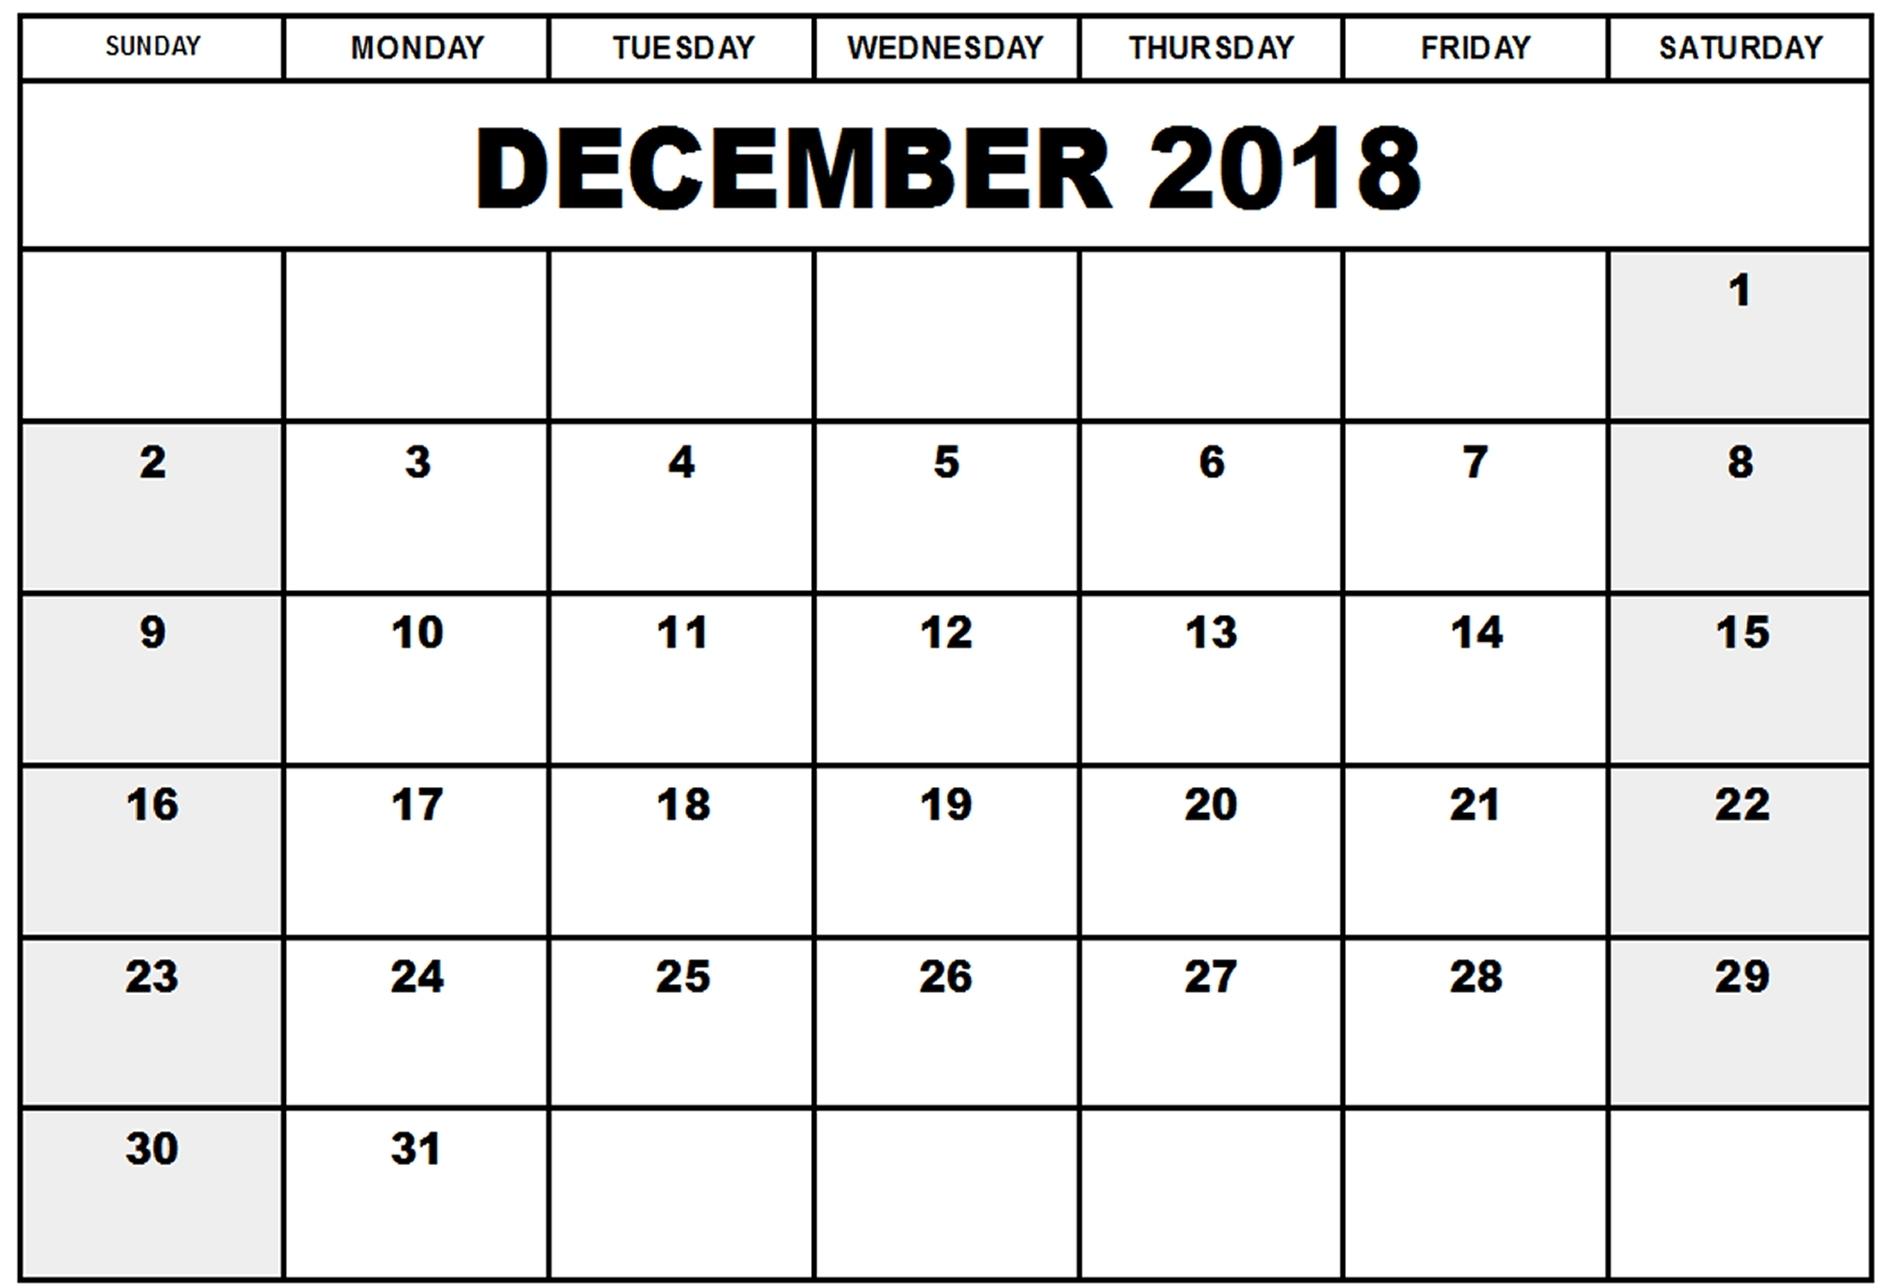 December 2018 Calendar Excel Pdf - Free Printable Calendar